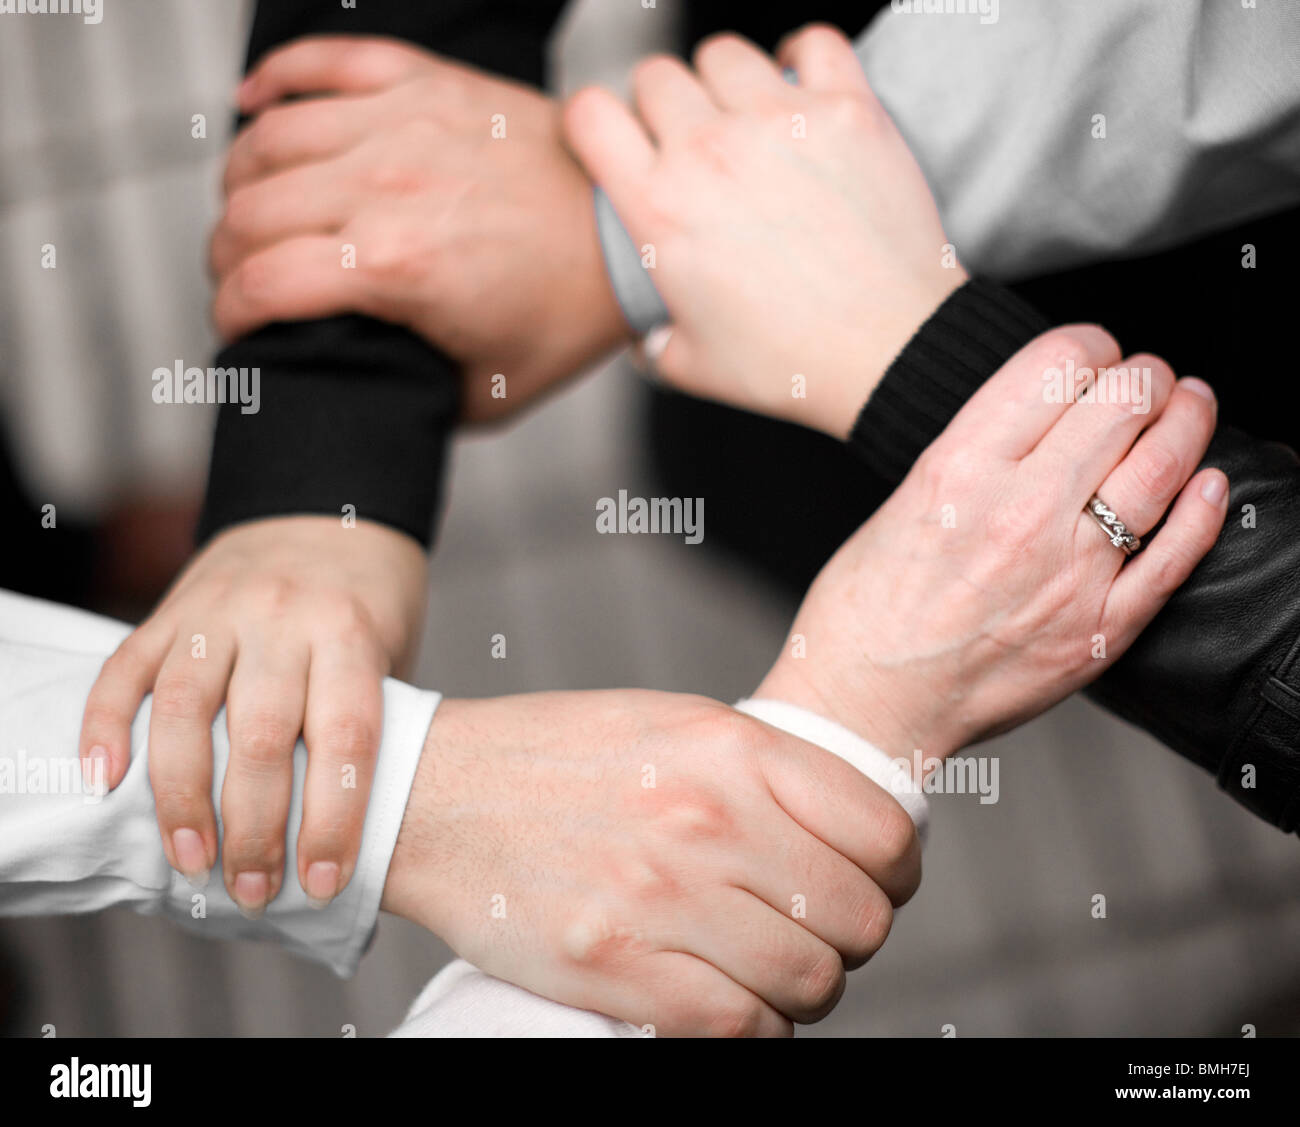 hands representing team work - Stock Image